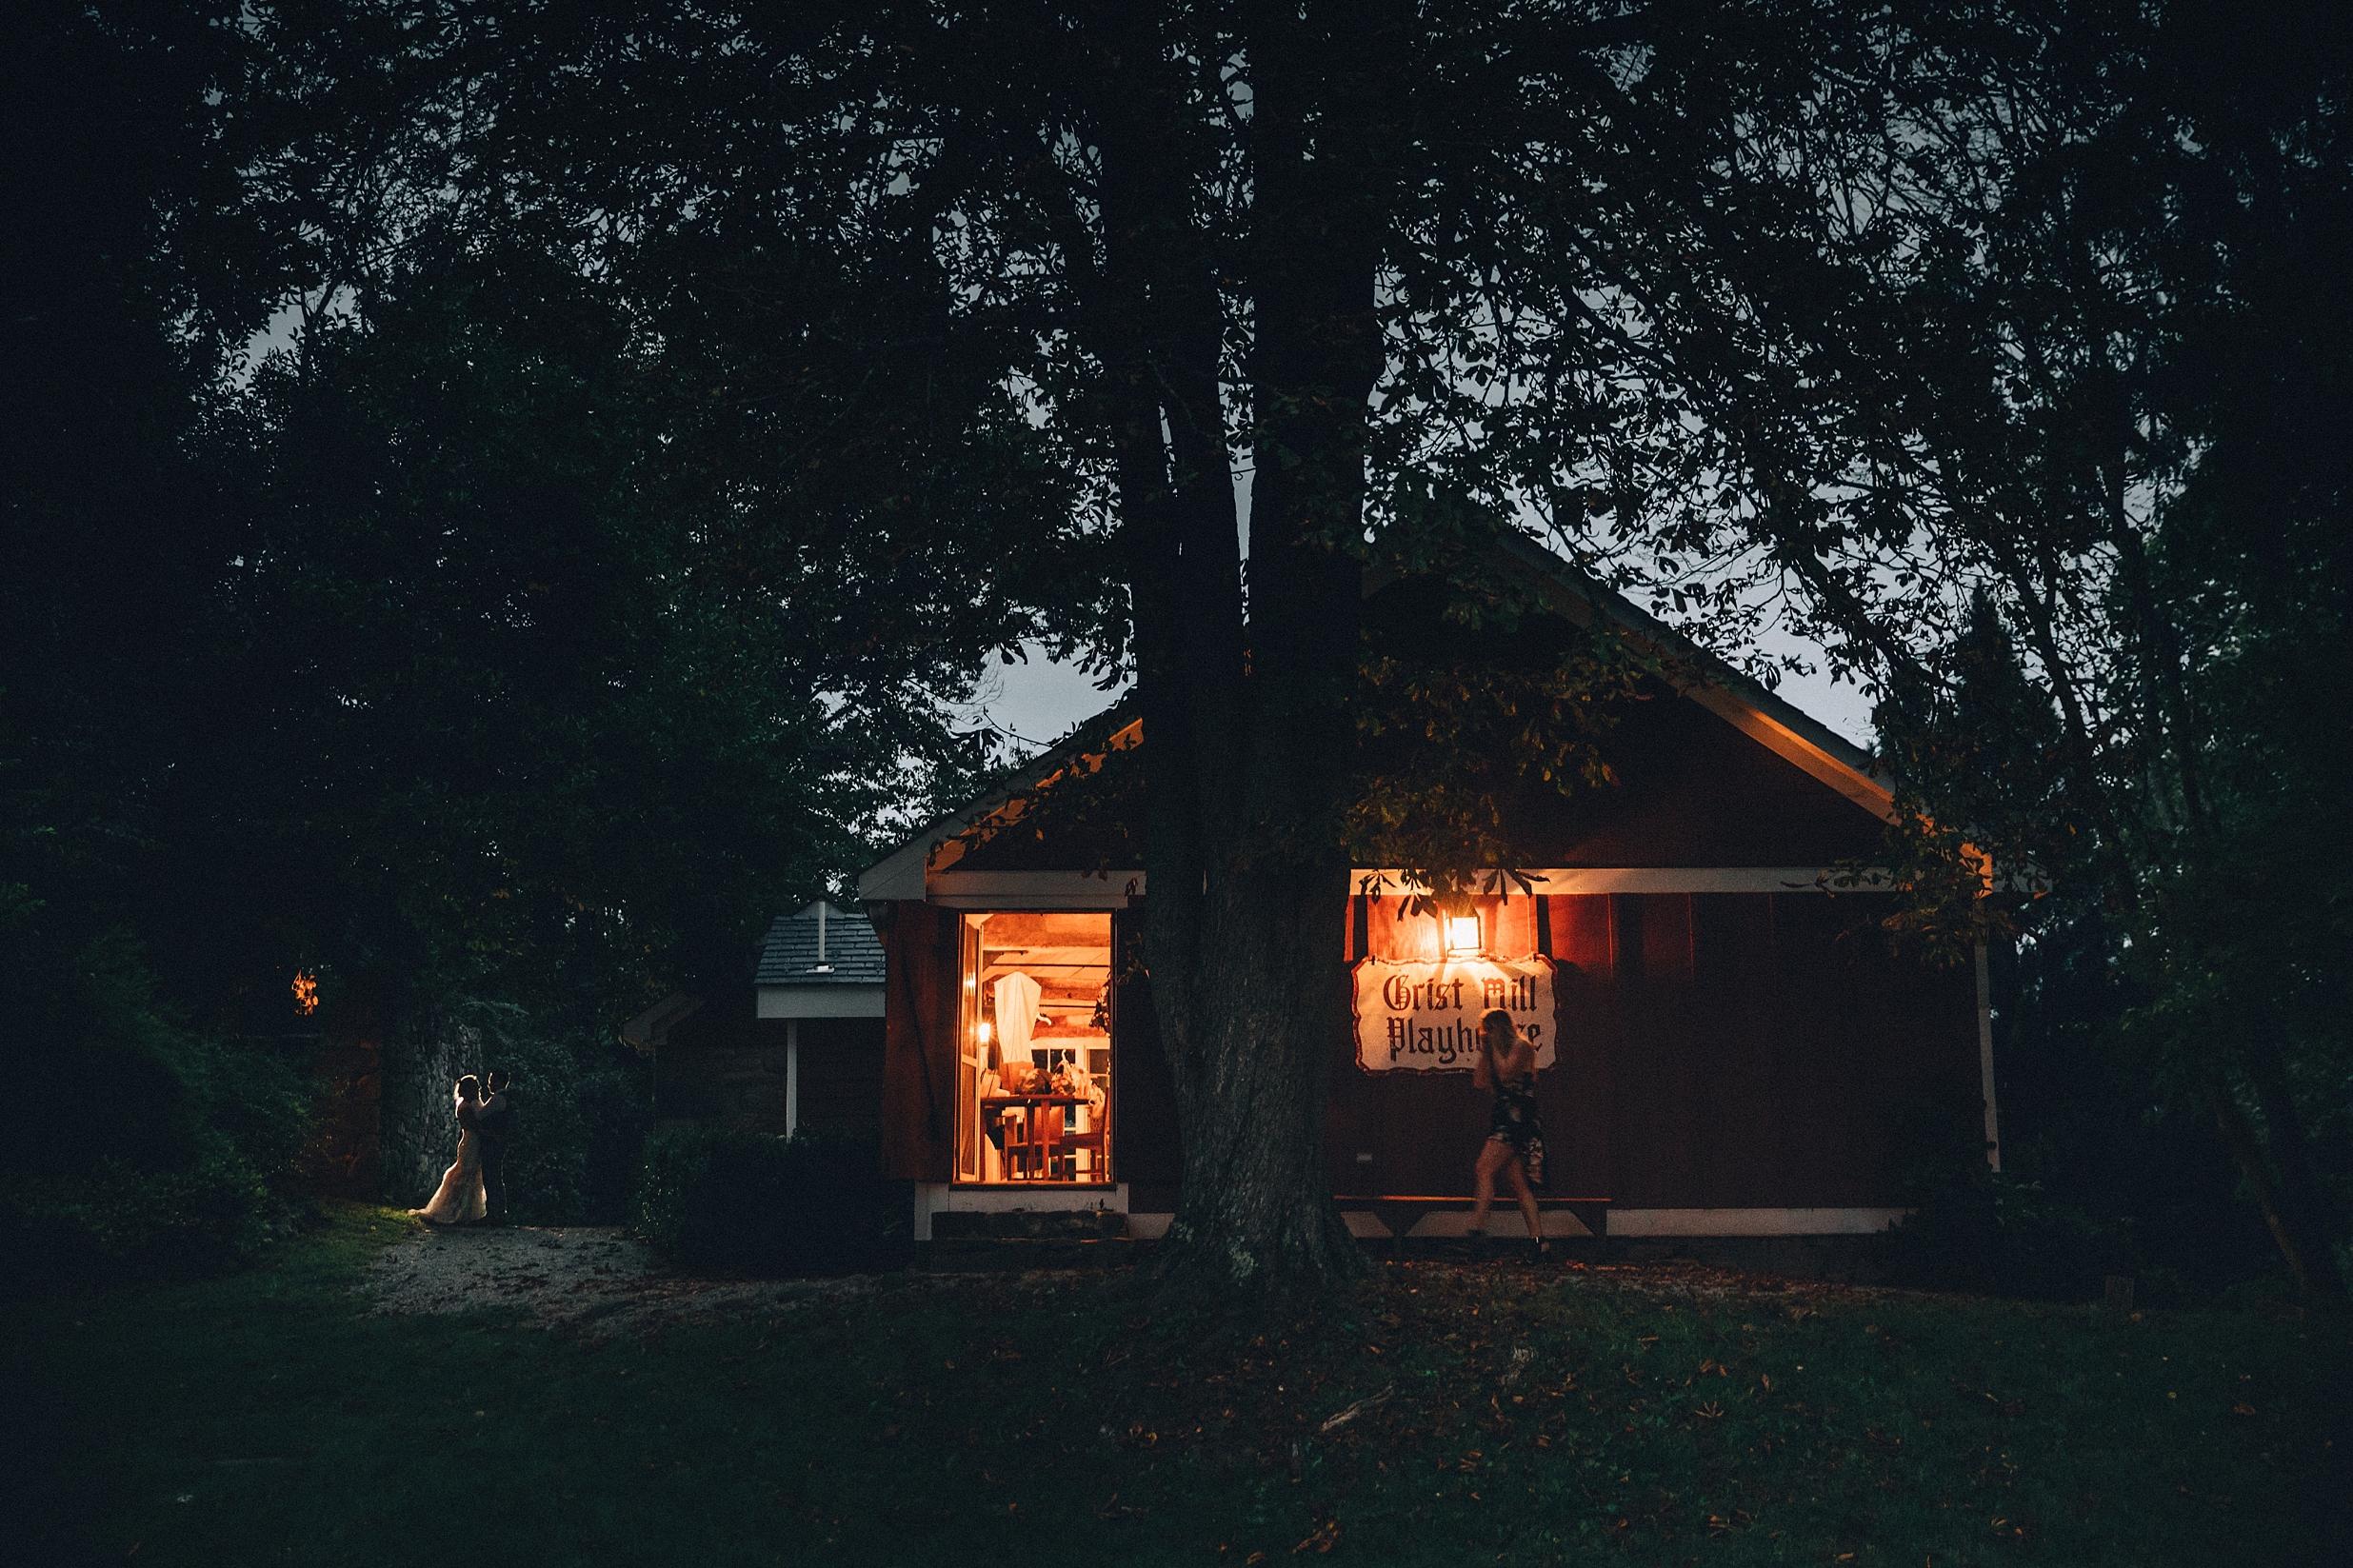 crossed-keys-outdoor-ceremony-camp-wedding-photo_0065.jpg